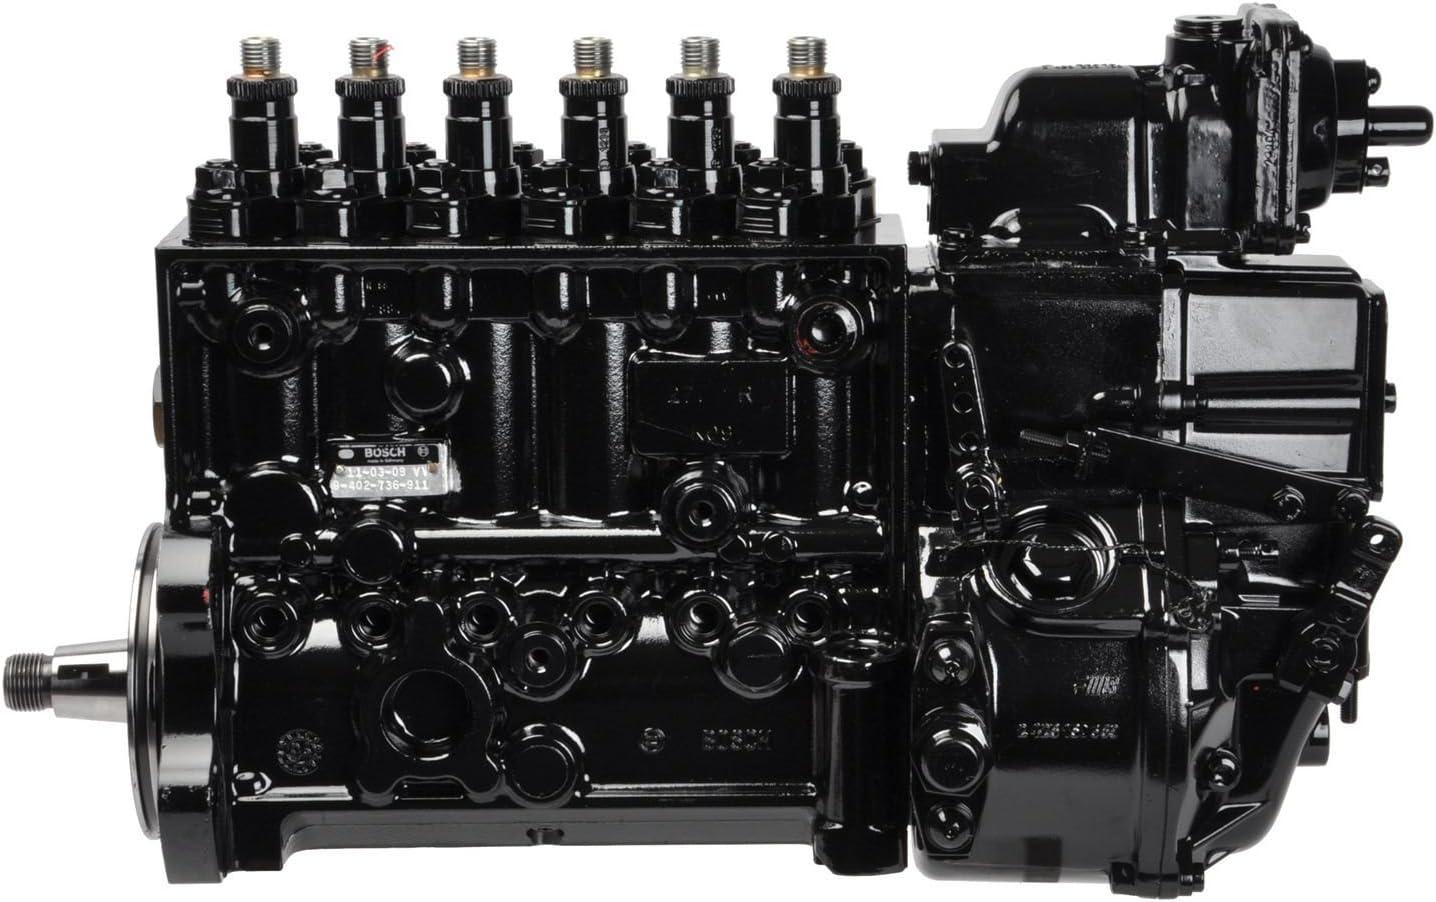 A1 Cardone 2H-303 Remanufactured Fuel Injection Pump